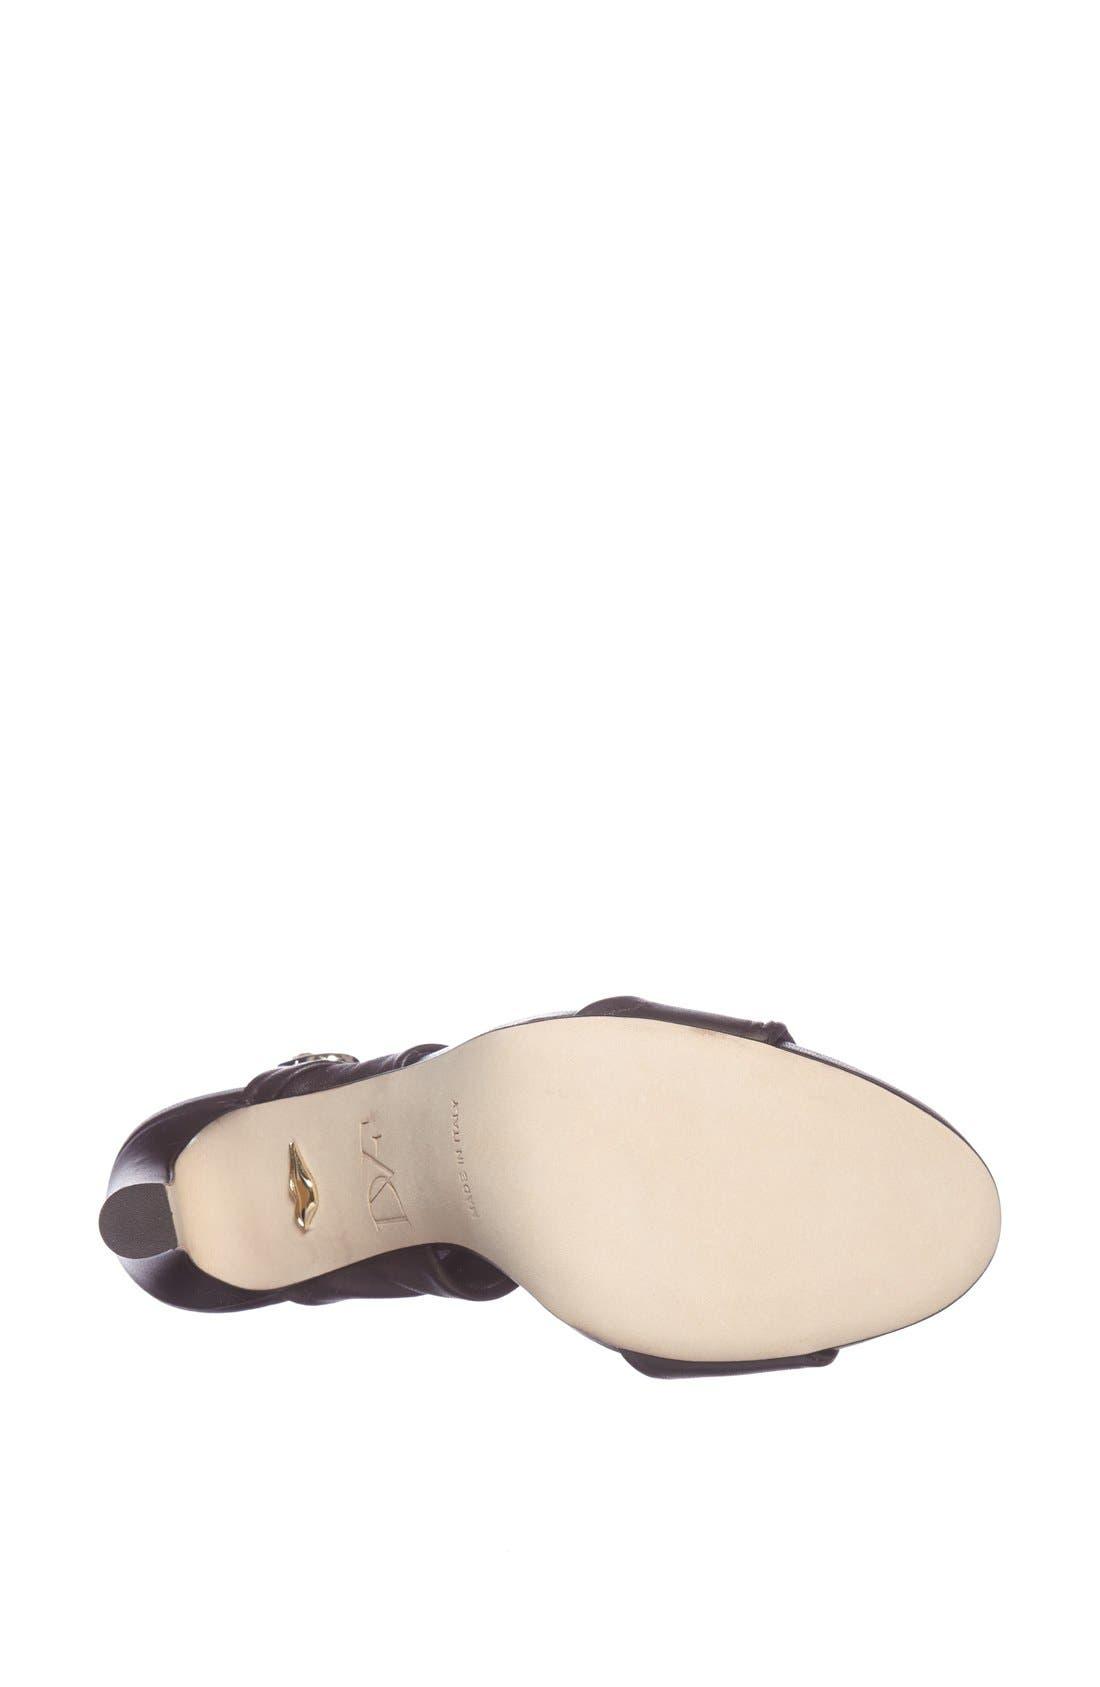 Alternate Image 3  - Diane von Furstenberg 'Jacey' Leather Sandal